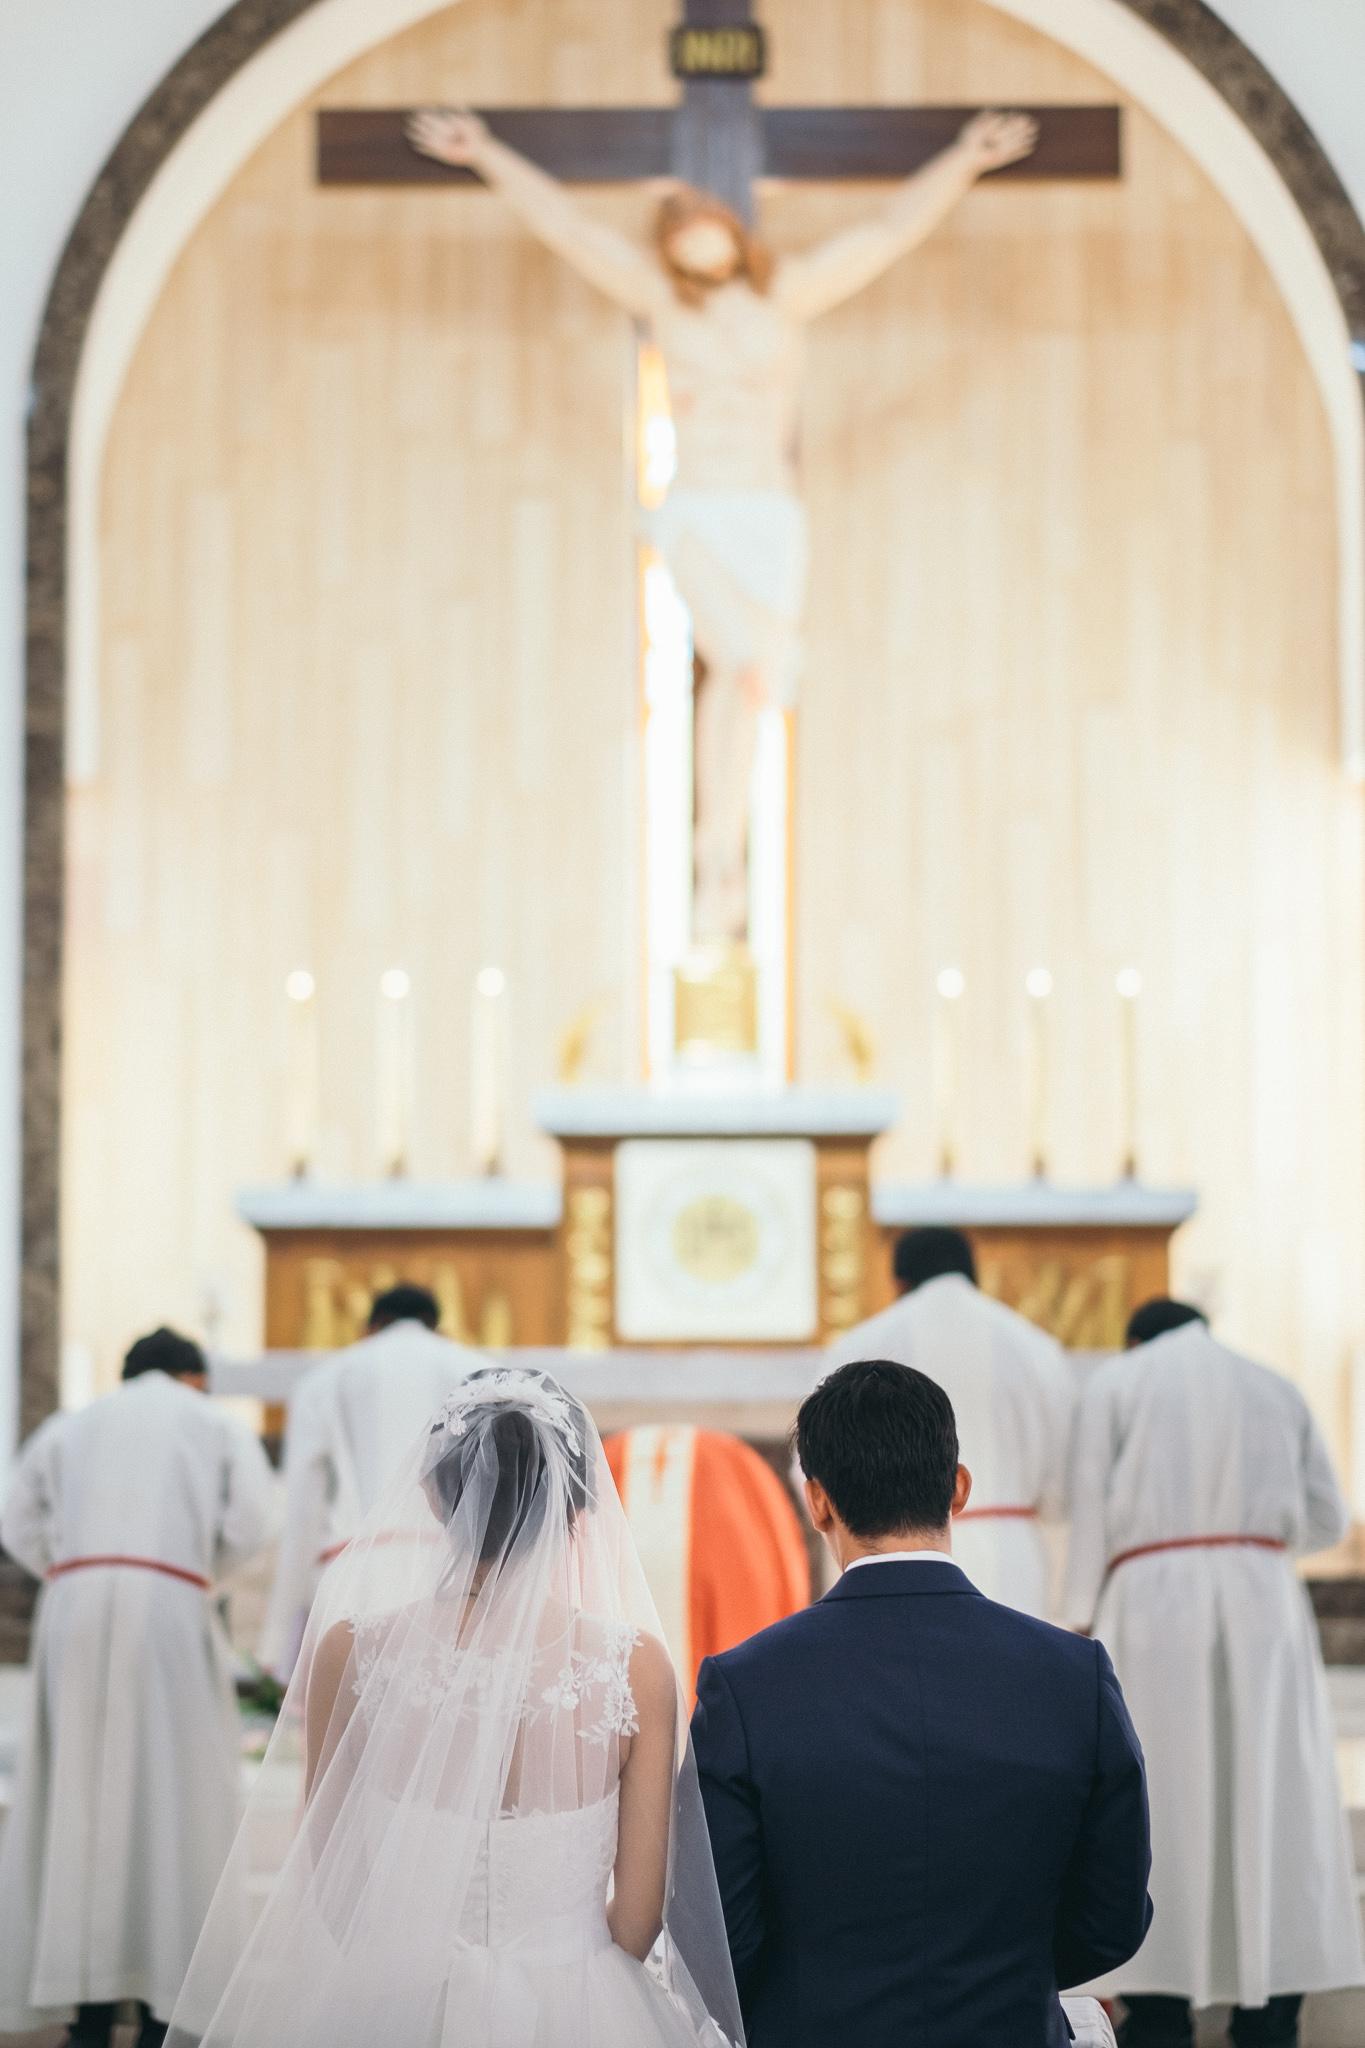 Juxtapose Pix - Wedding - Kelvin & Serene - church regent hotel 00027.jpg